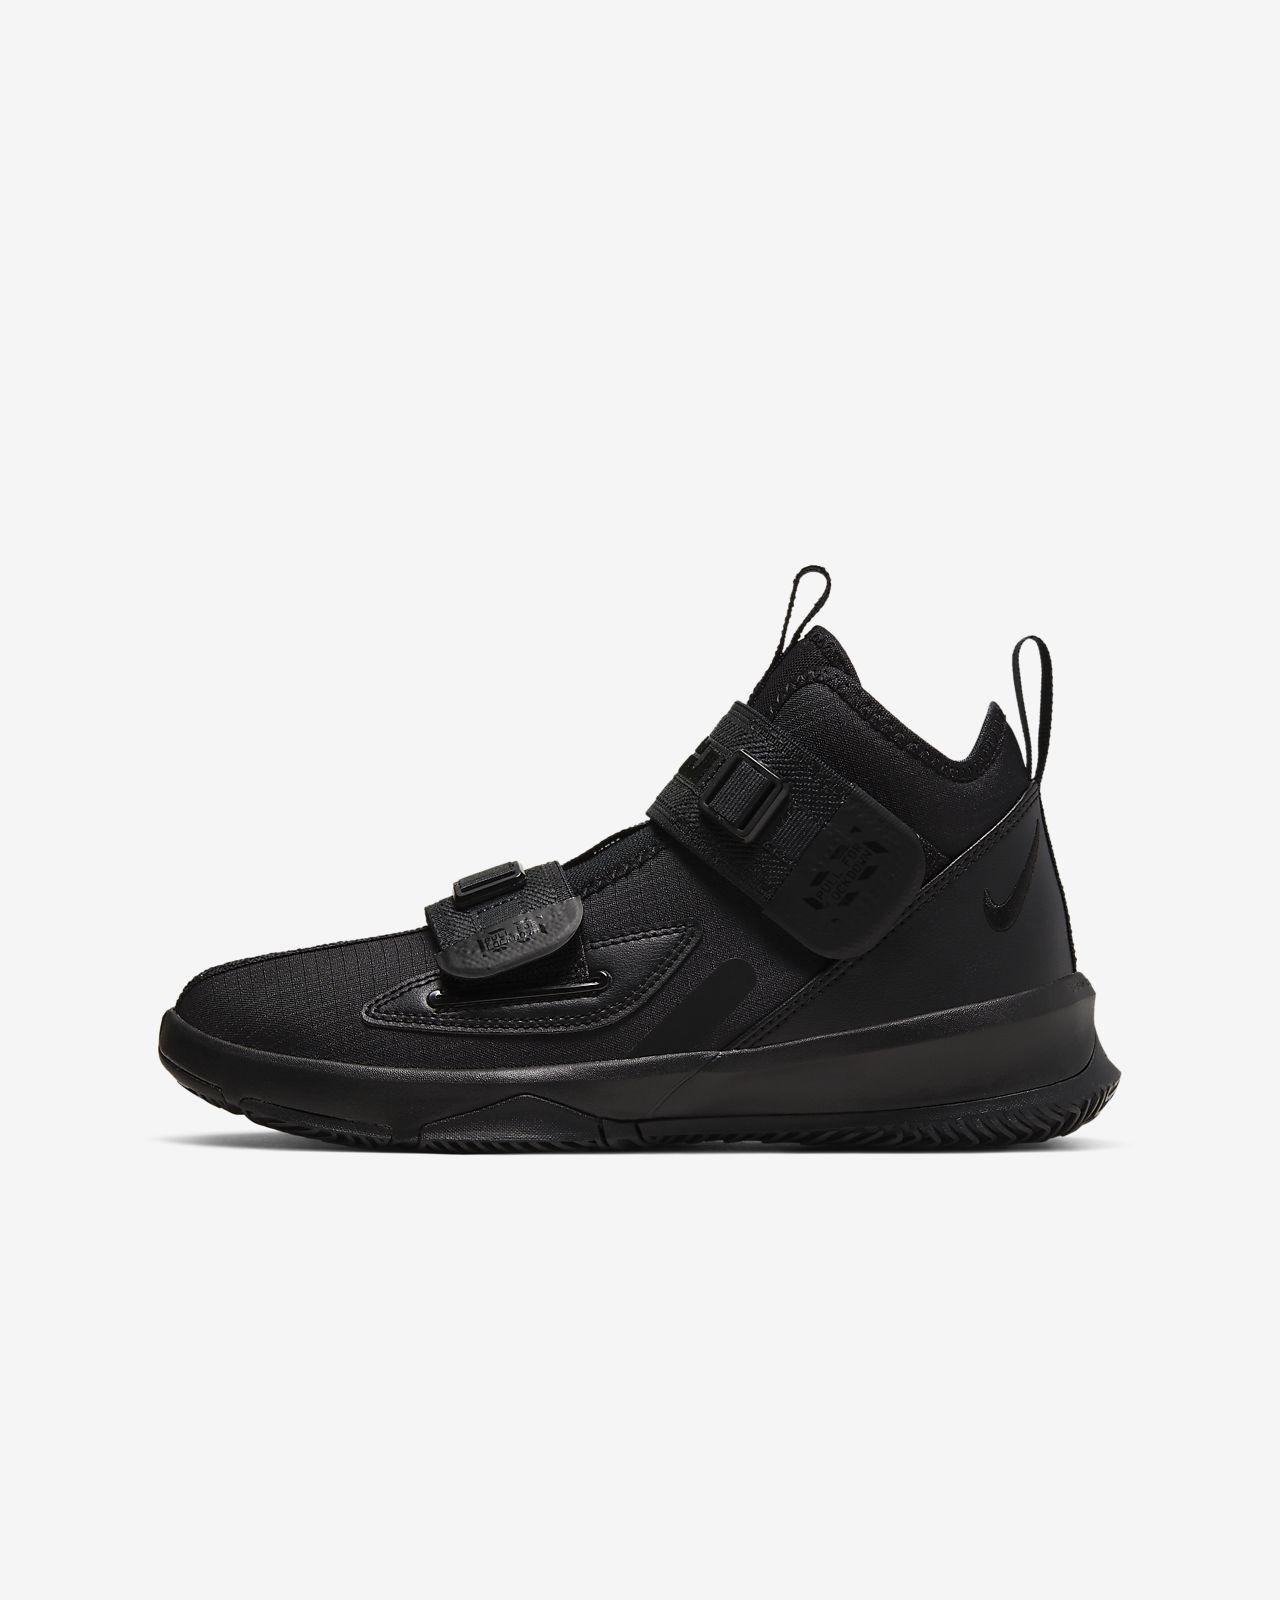 LeBron Soldier 13 Big Kids' Basketball Shoe